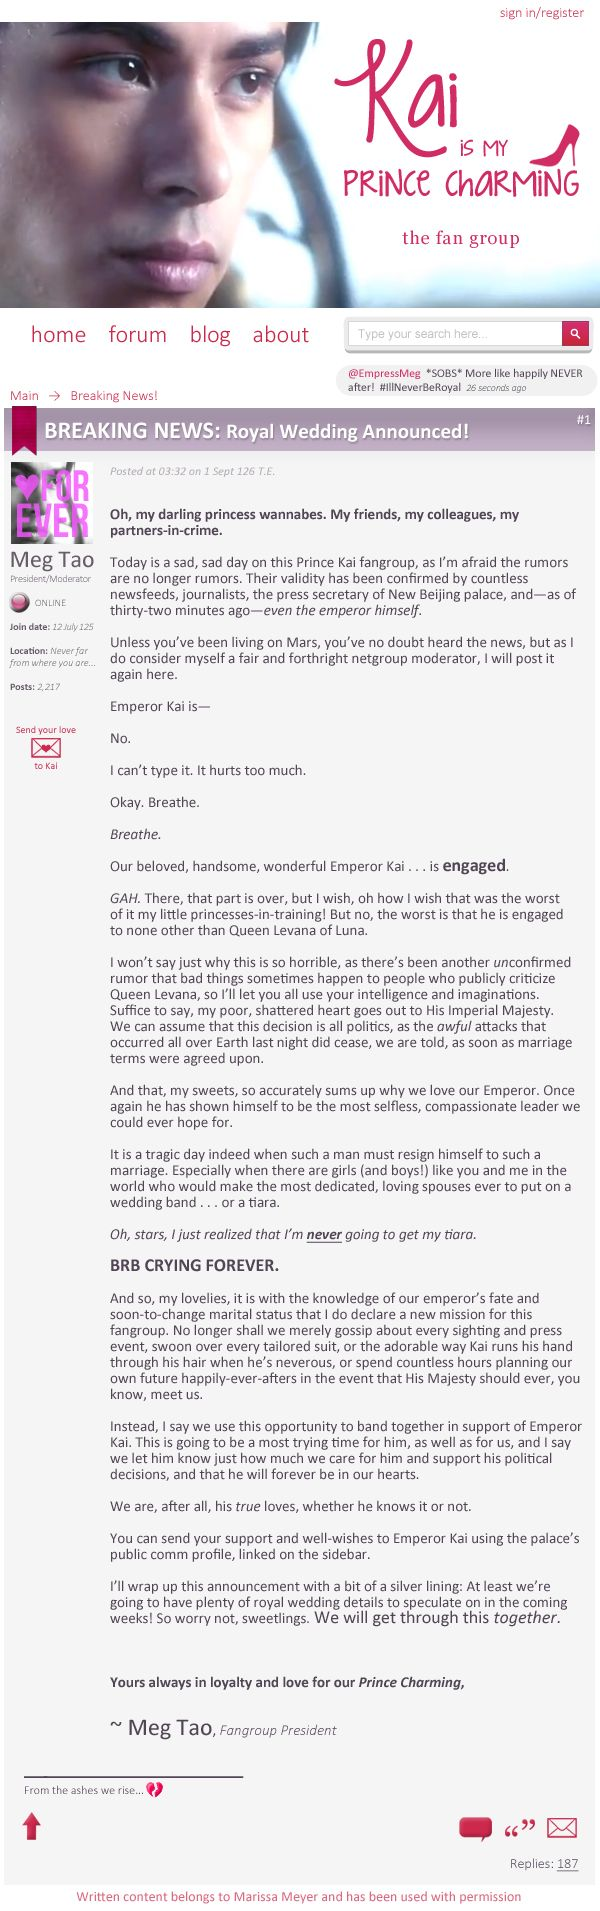 """Breaking News! Royal Wedding Announced!"" Kai's Fanclub President is devastated... - #Cress Blog Tour 2014"